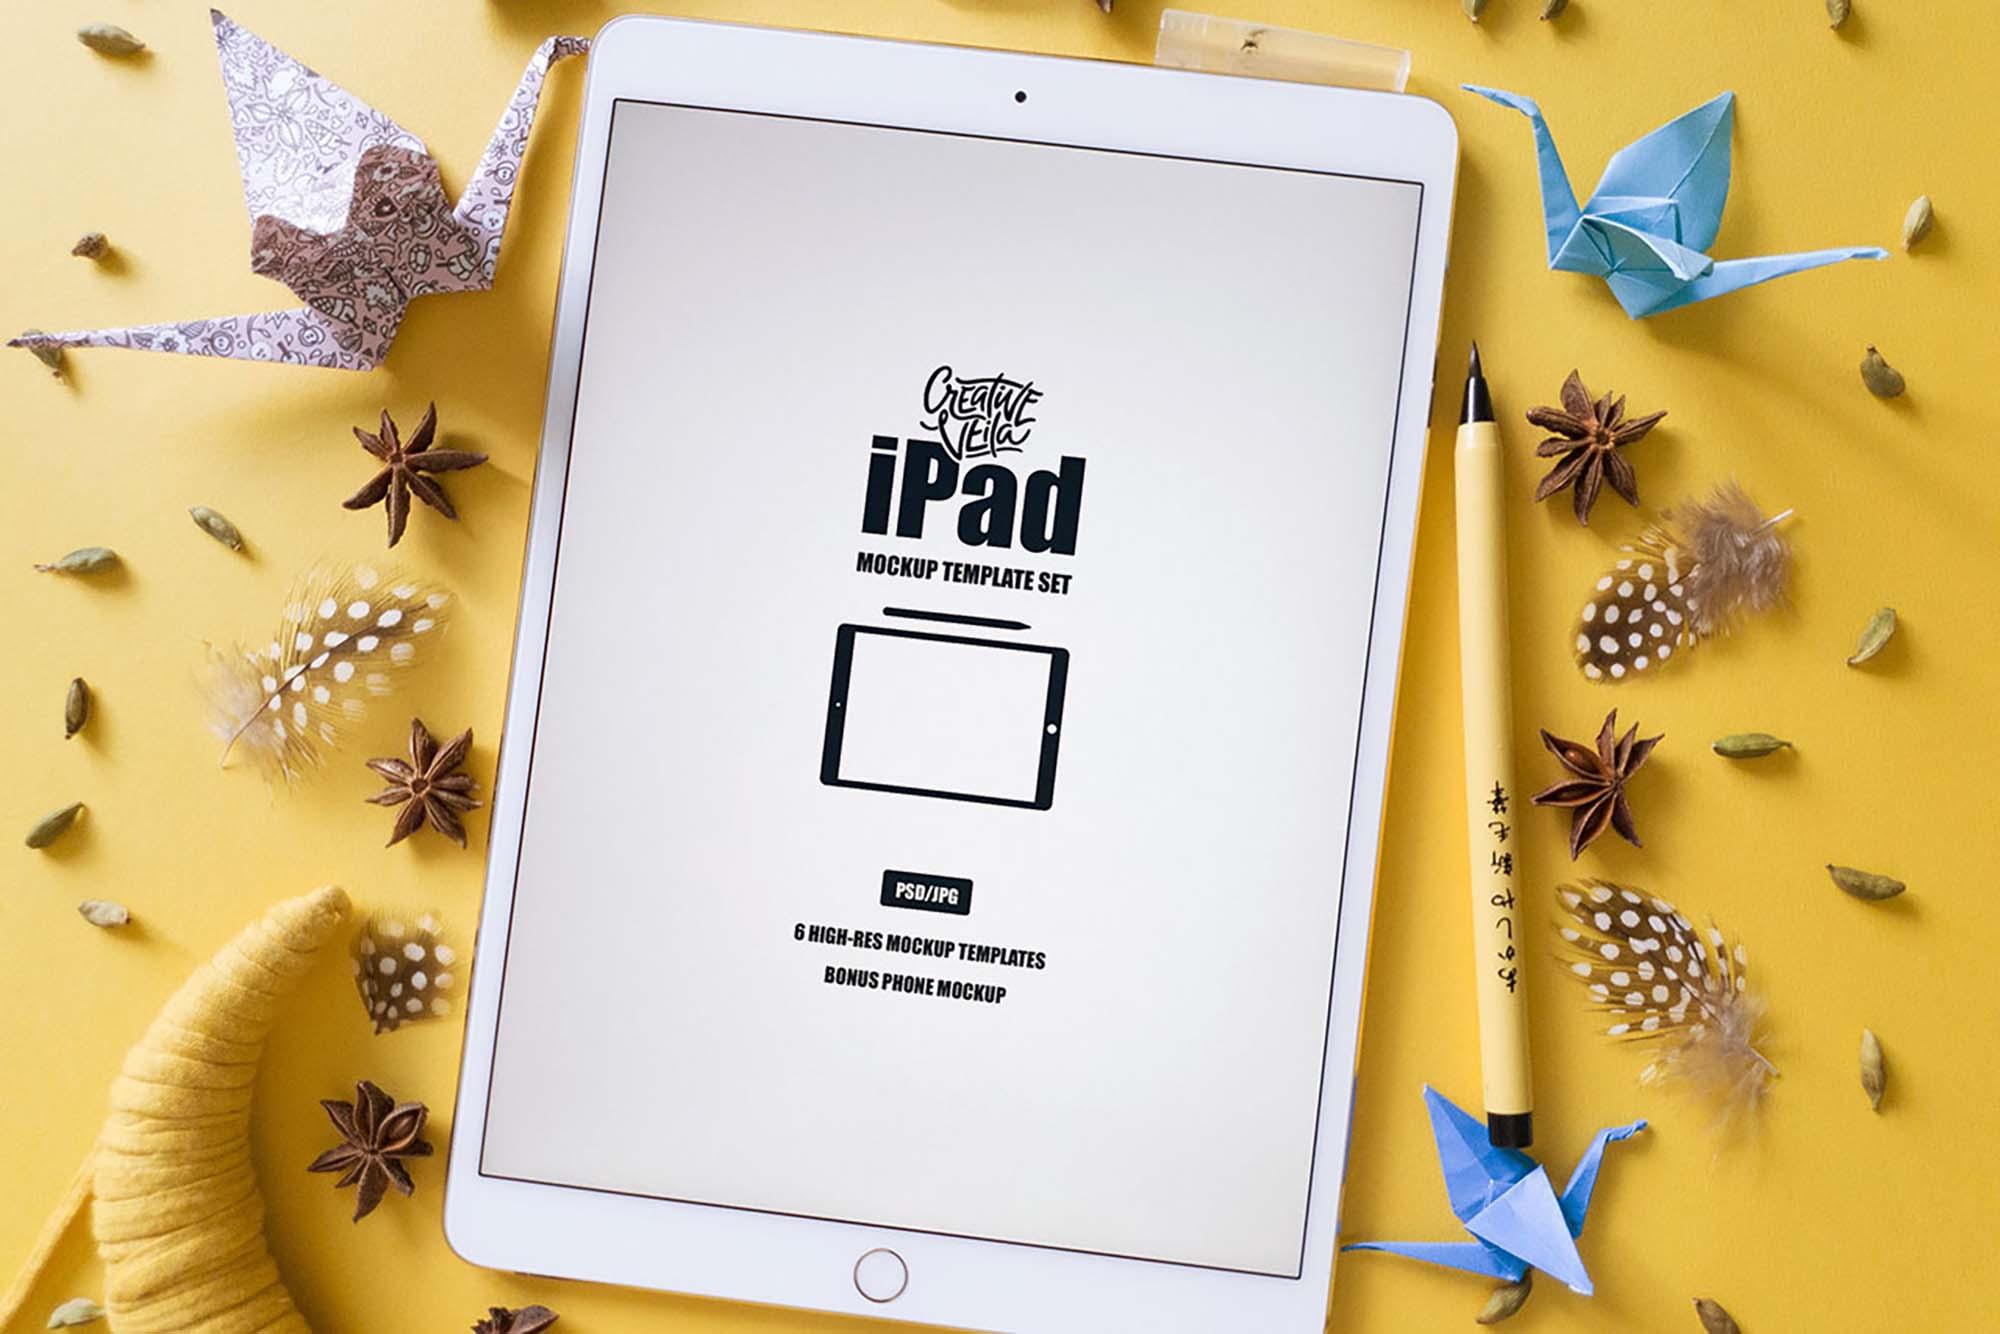 iPad Mockup Template 3